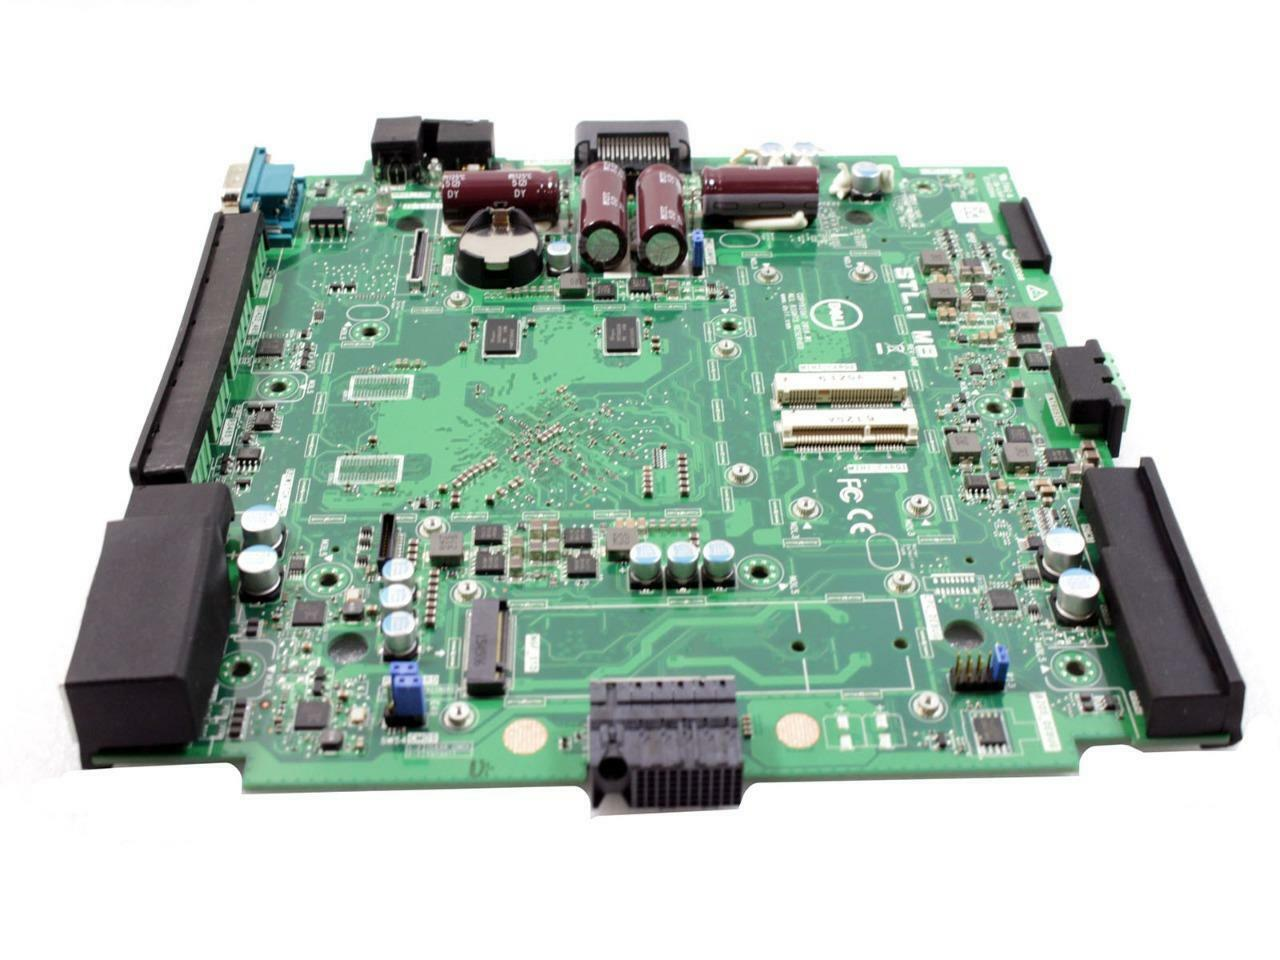 DELL EDGE GATEWAY 5000 Intel Atom CPU E3825 1.33GHz 2GB Ram No HD